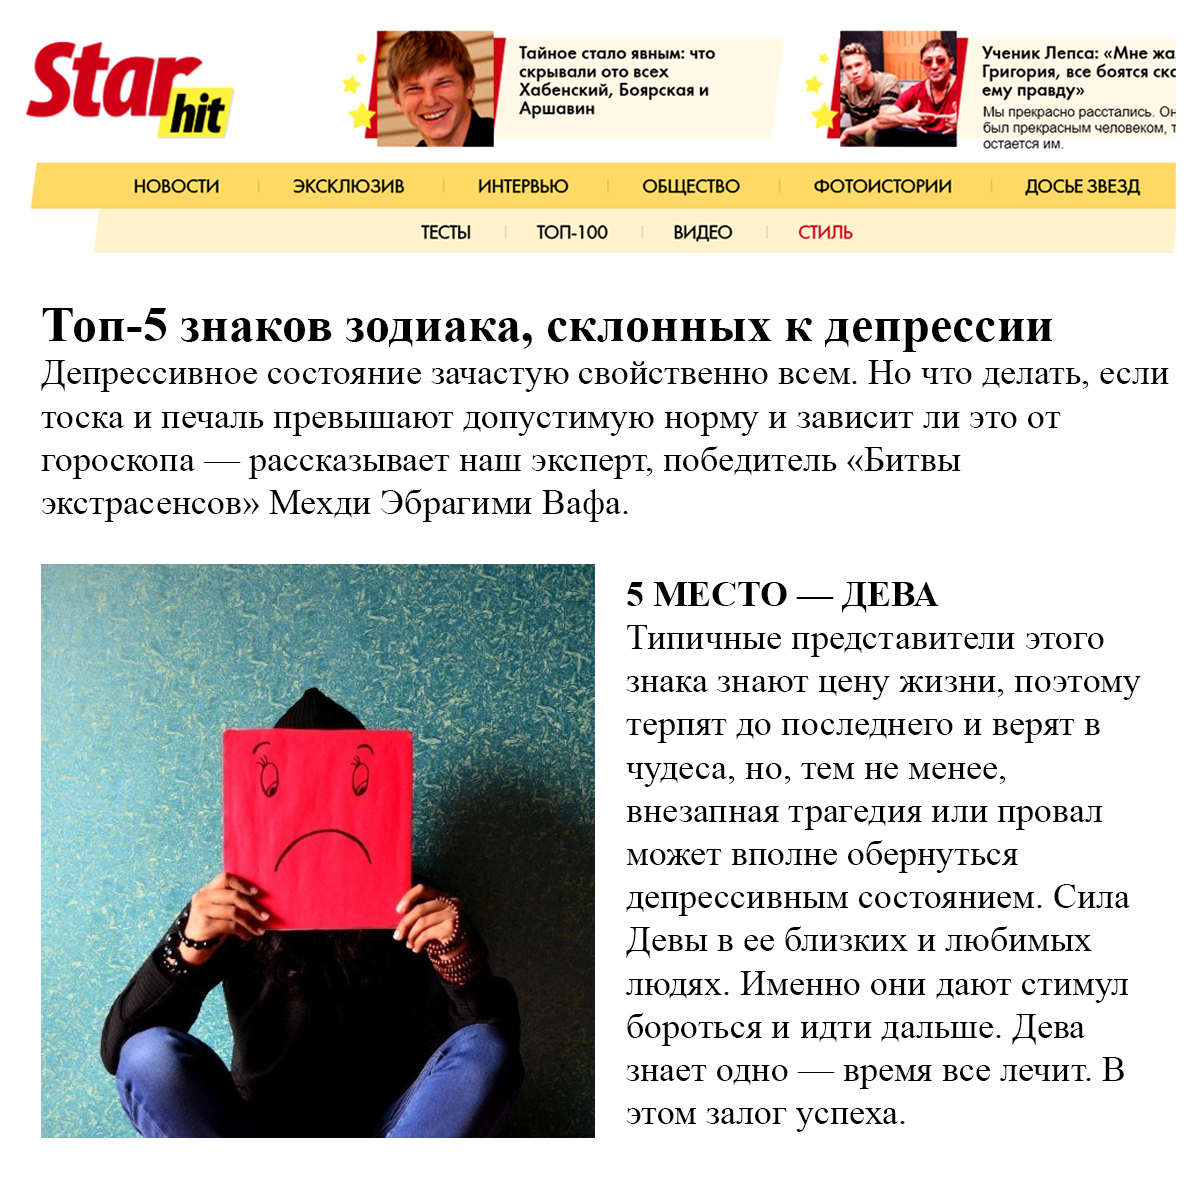 STARHIT.RU: Топ-5 знаков зодиака, склонных к депрессии. Прогноз от Мехди Эбрагими Вафа